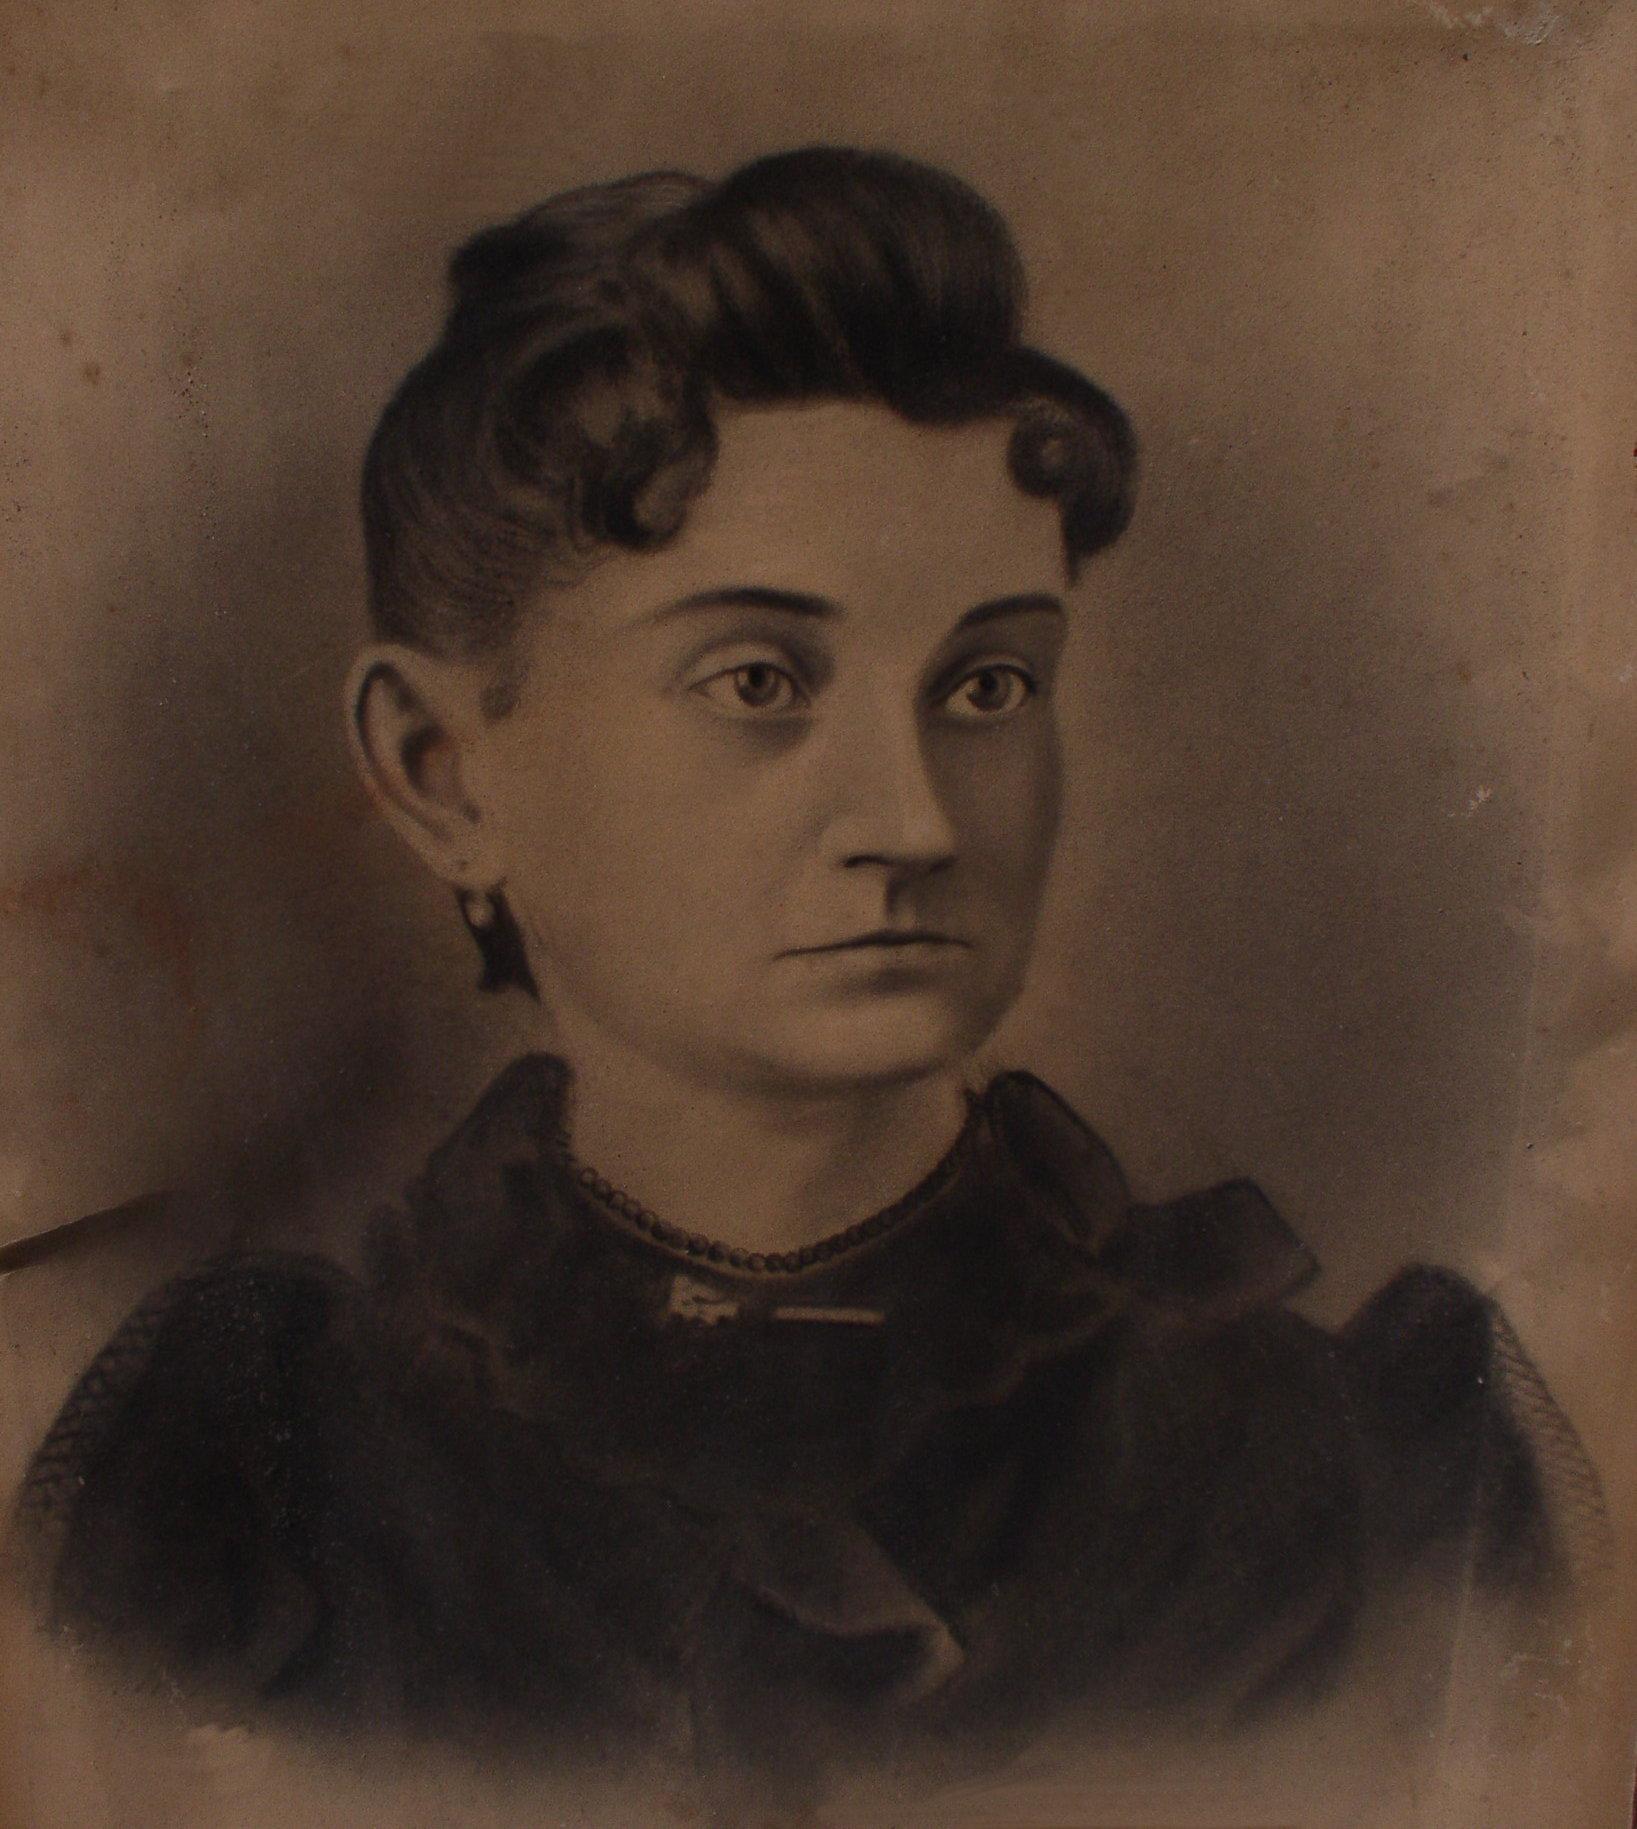 Caroline Mergole